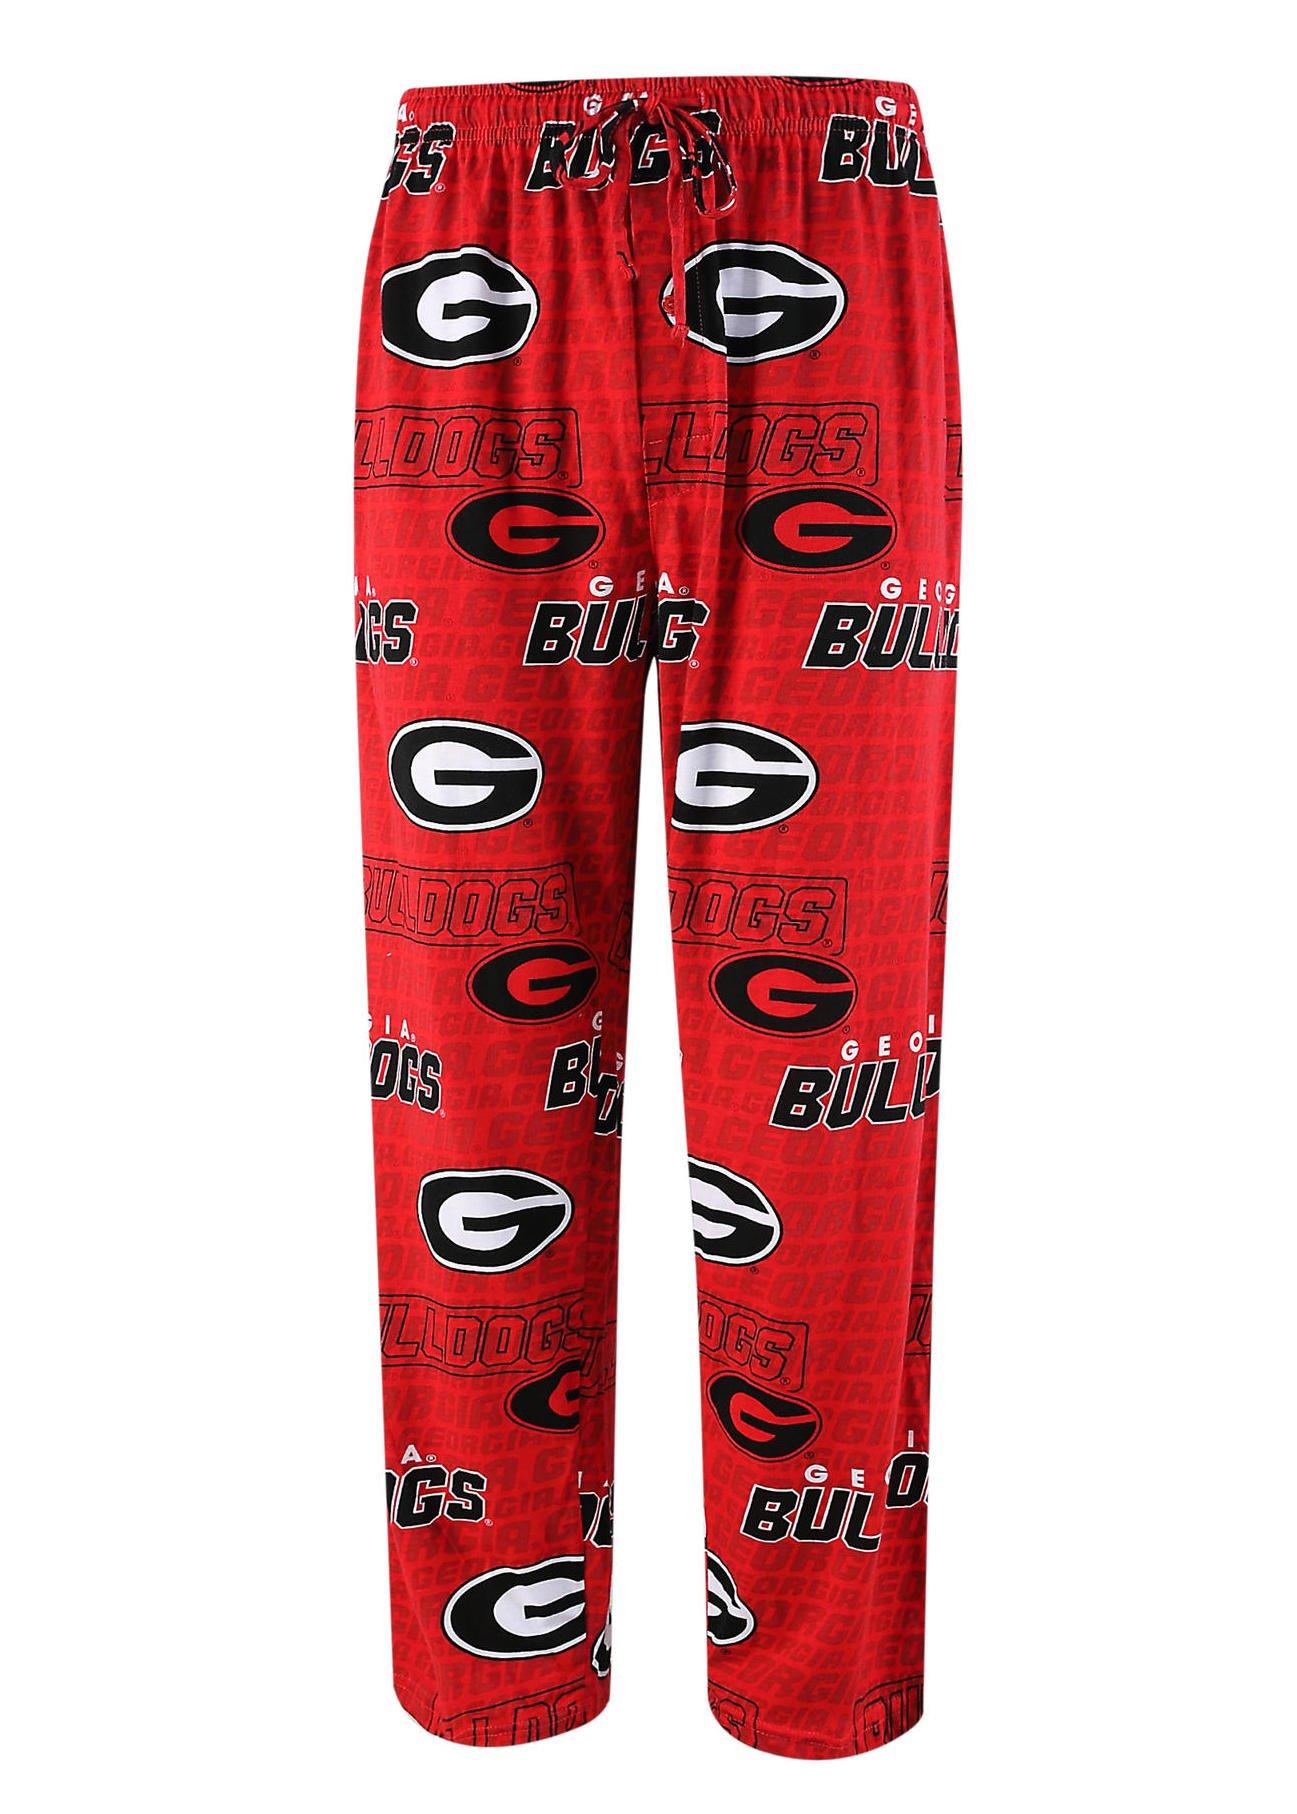 Sideline Apparel University of Georgia Bulldogs Pajama Bottoms Sleep Lounge Pants (Small) by Sideline Apparel (Image #1)